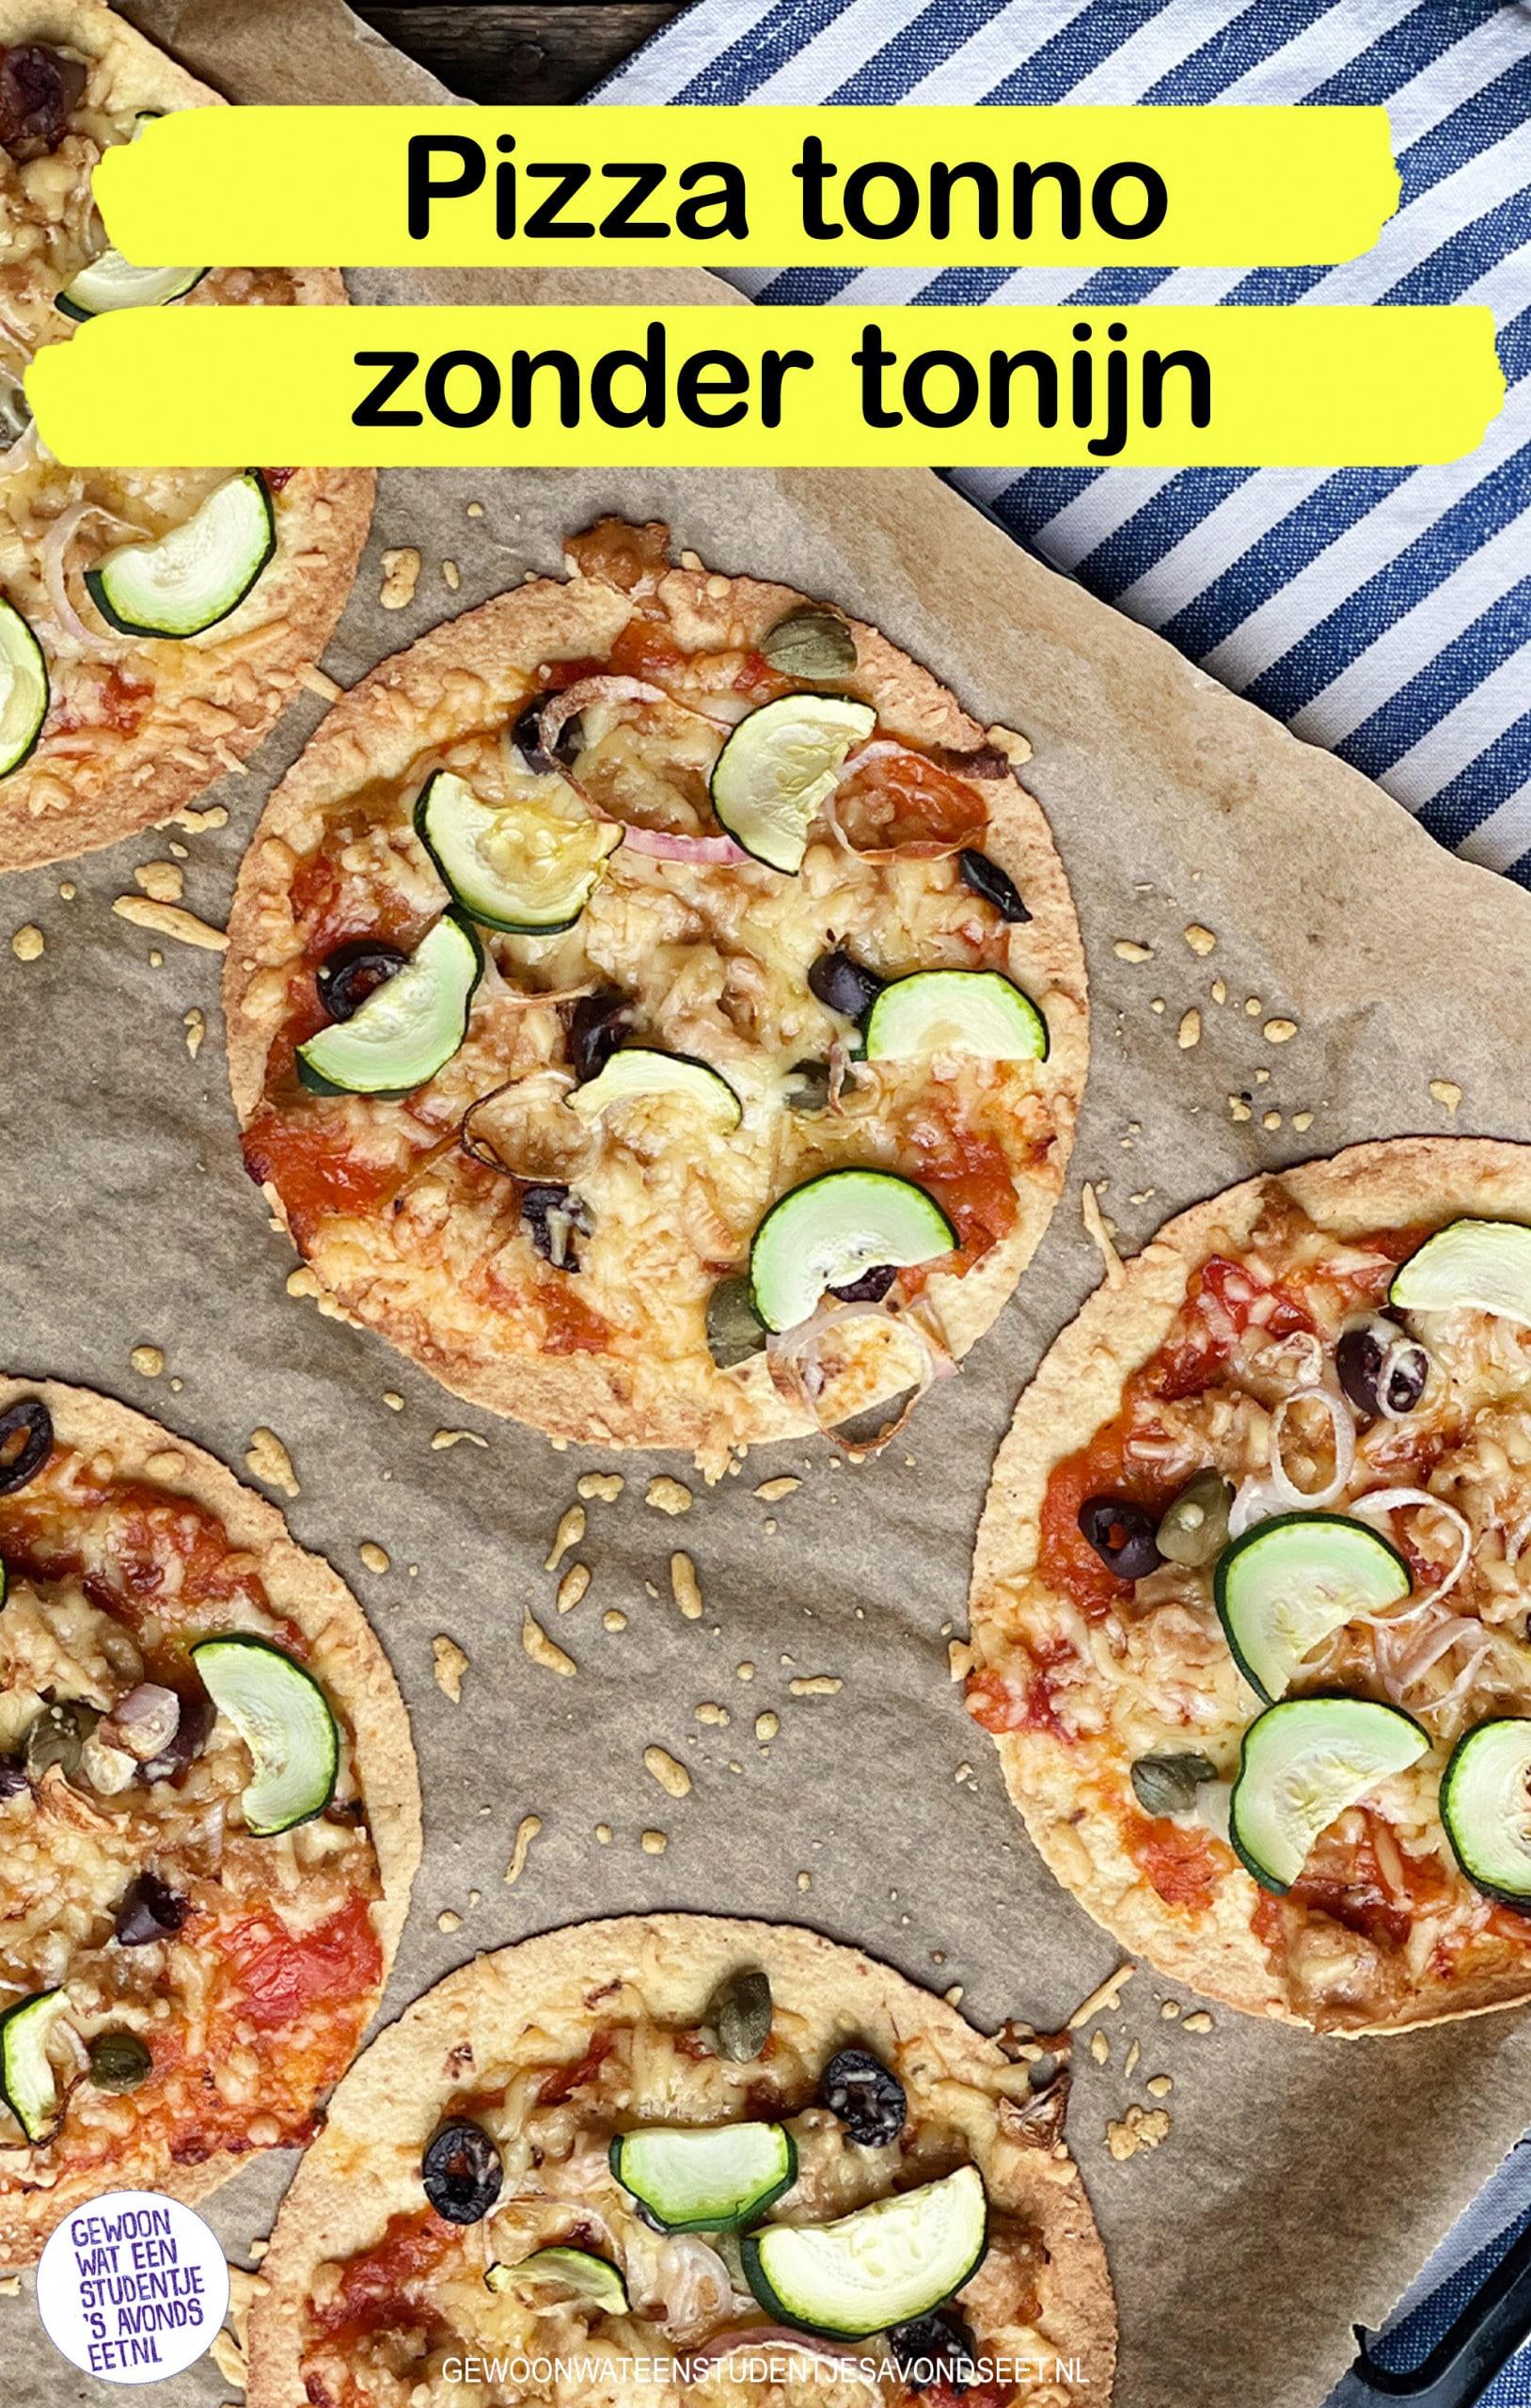 pizza tonno zonder tonijn